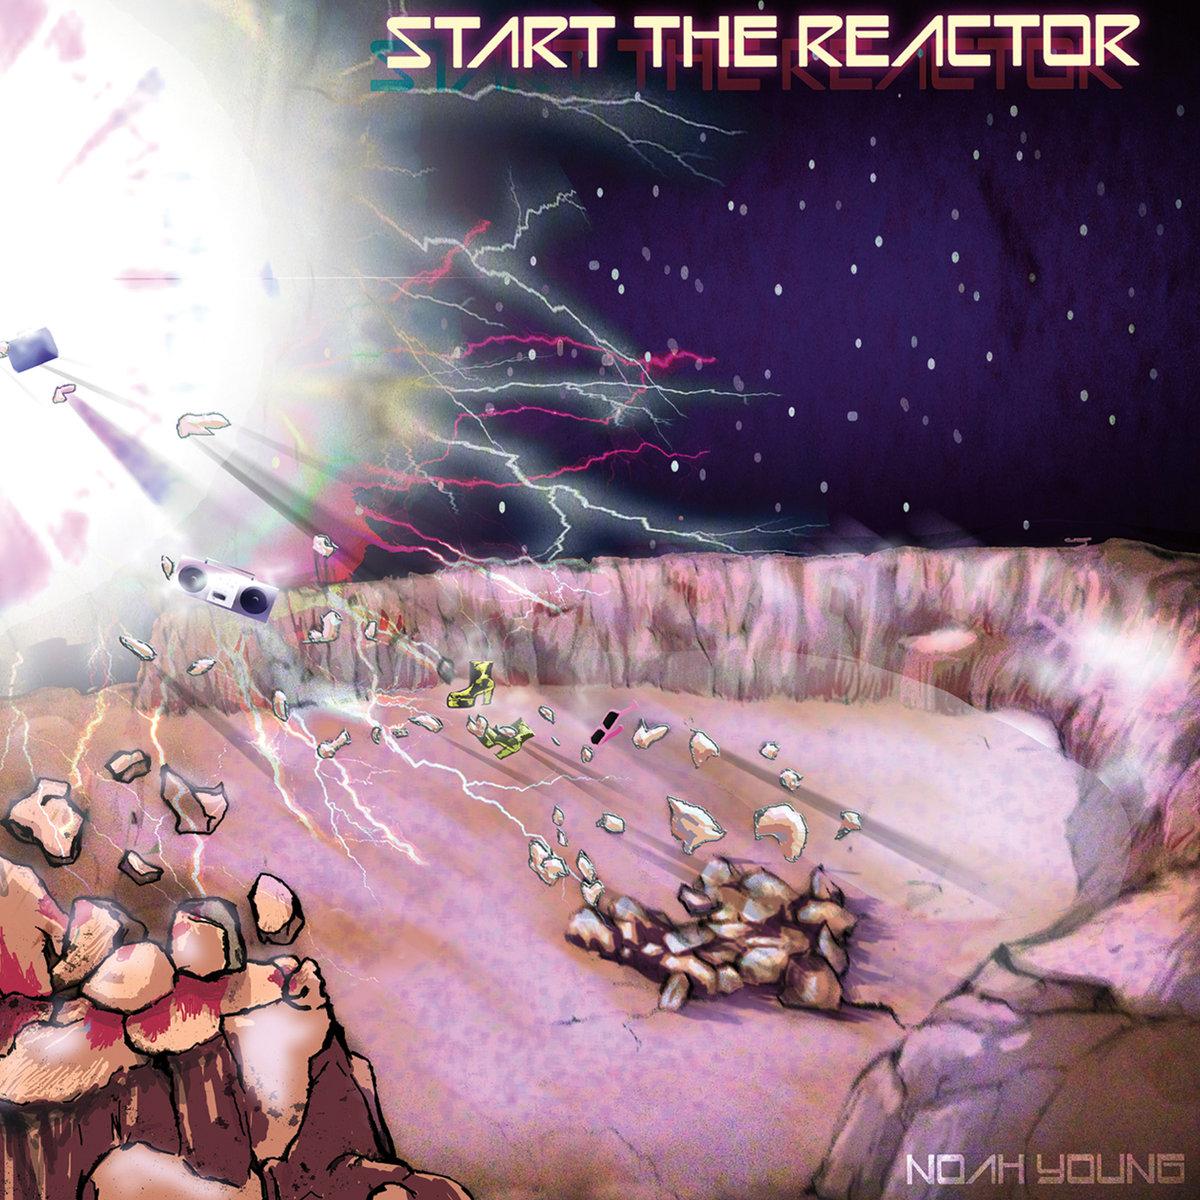 Noah Young - Start the Reactor Album Cover.jpg